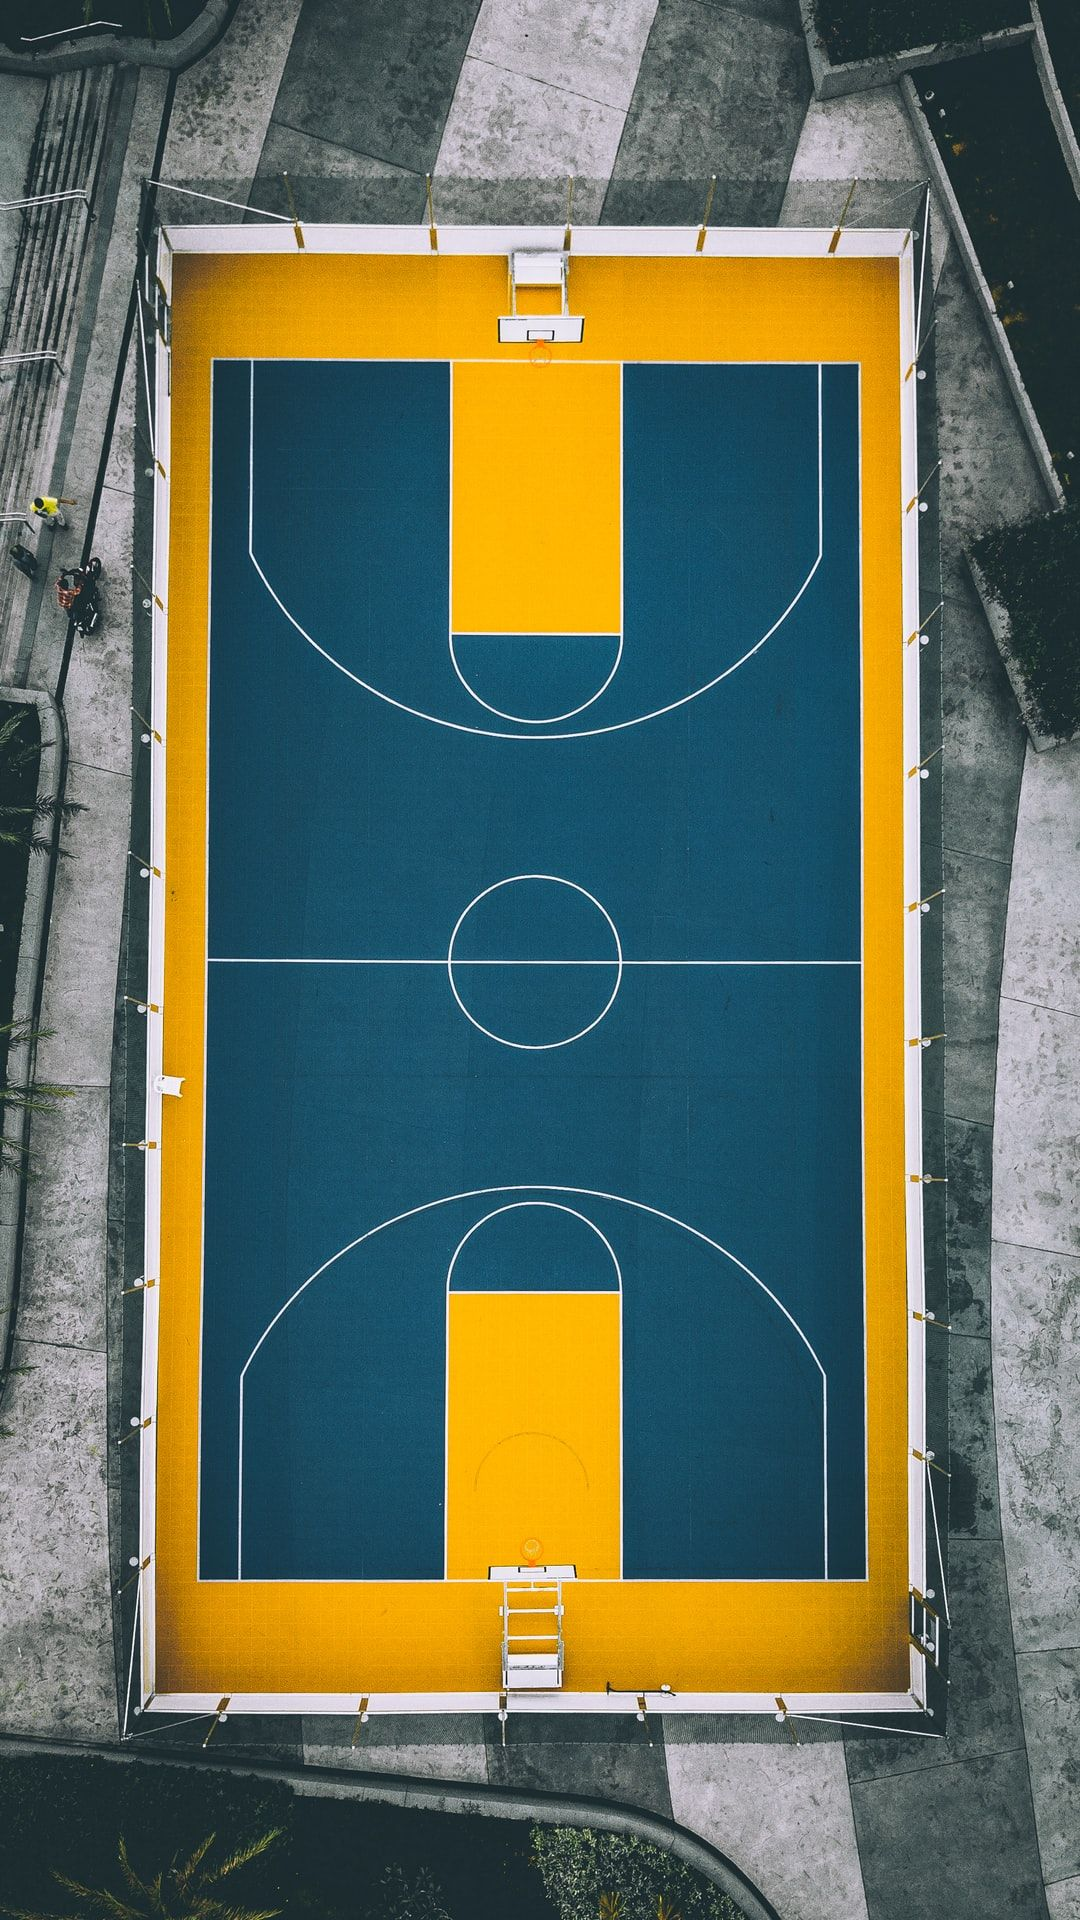 Basketball Court At Bukit Jalil Natio Hd Photo By Izuddin Helmi Adnan Izuddinhelmi On Unsplas Aerial Photography Drone Aerial Photography Aerial Images